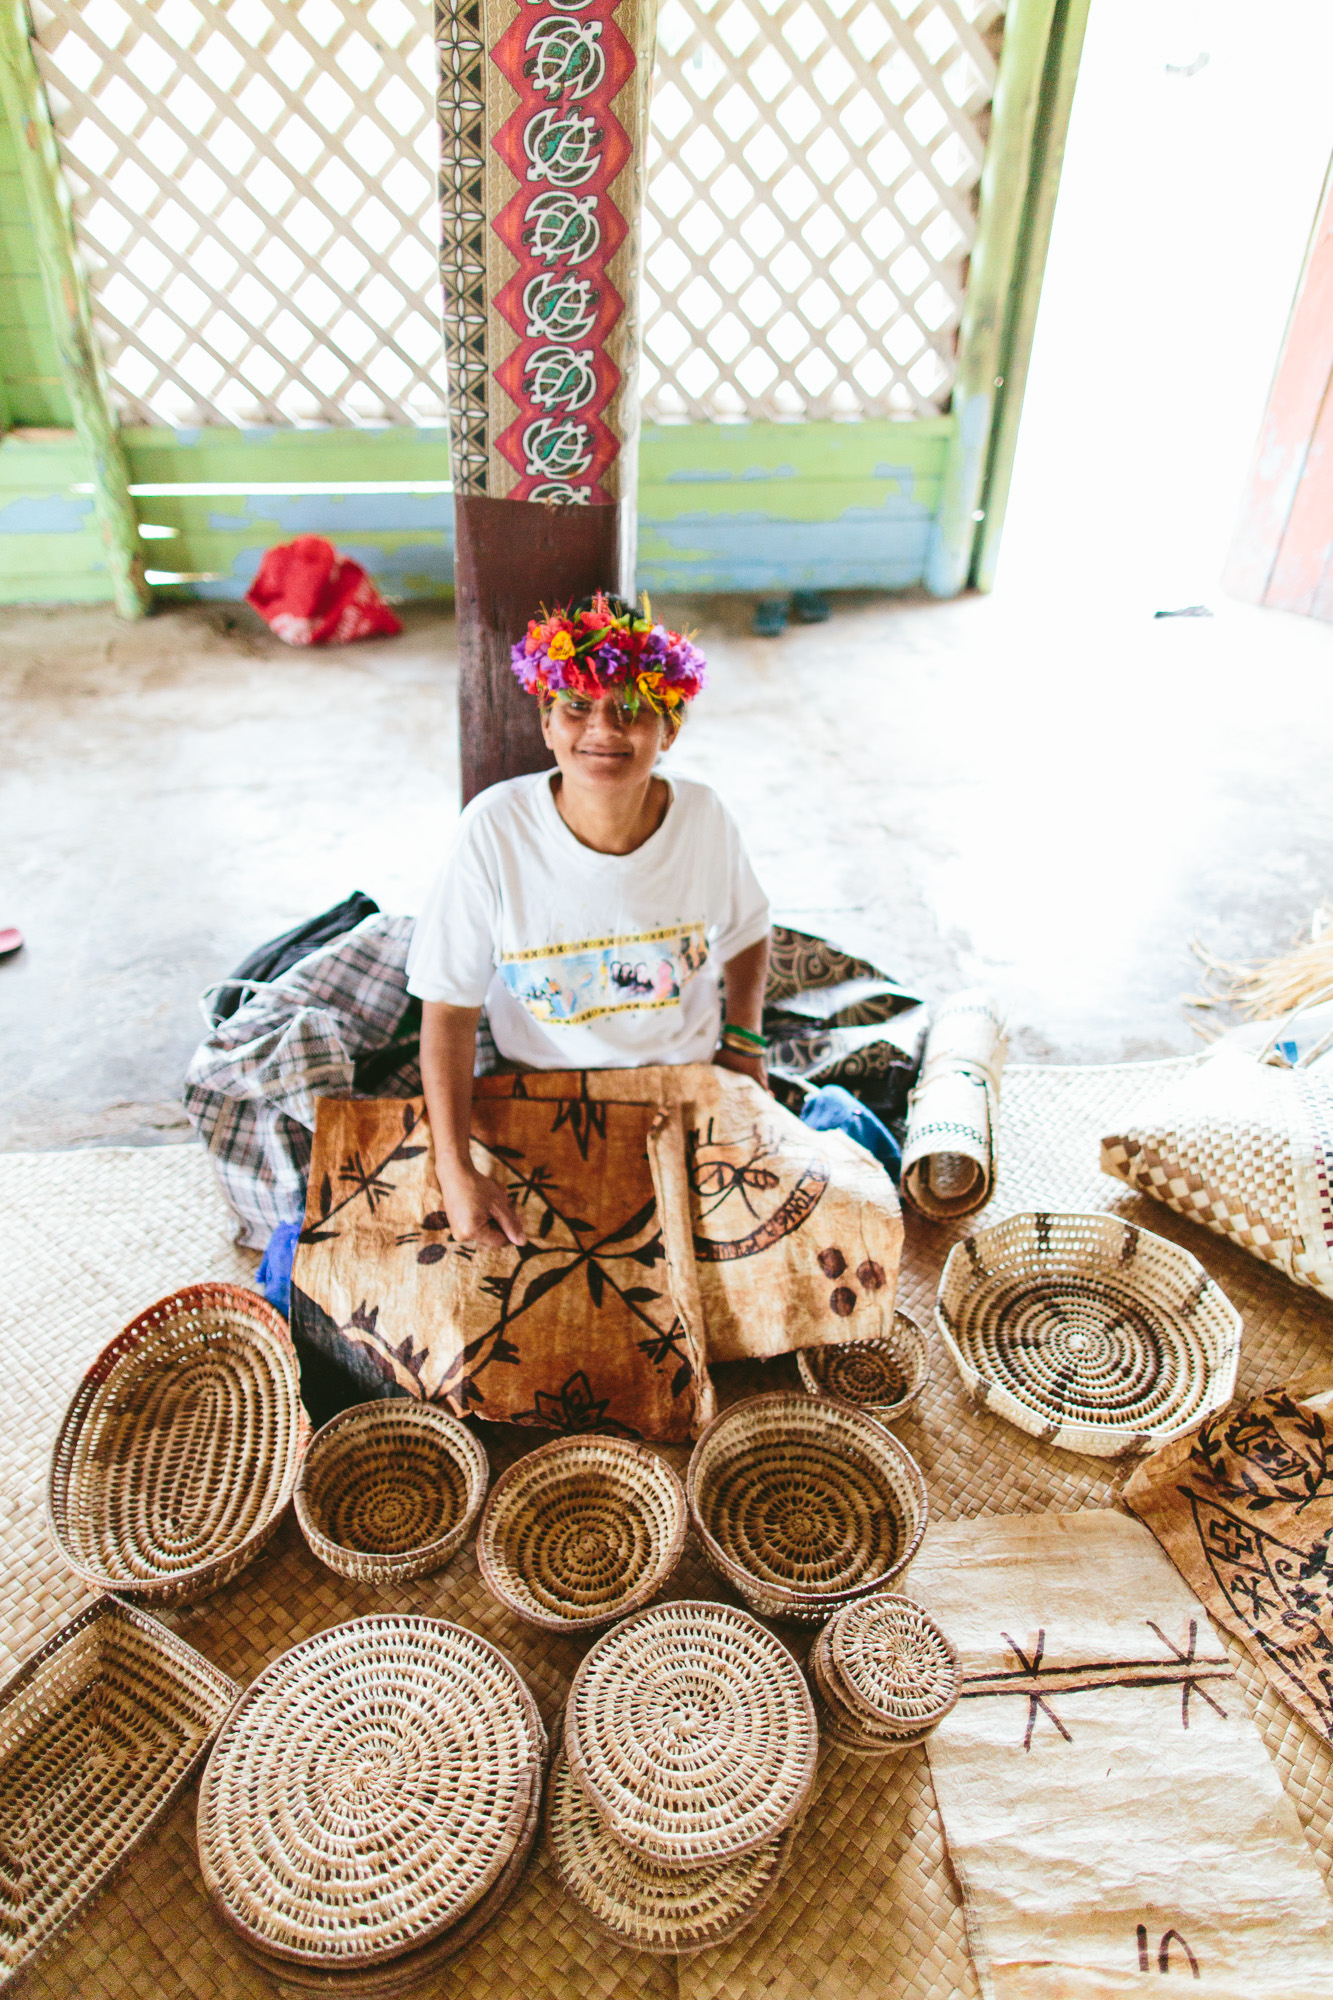 Fiji Village Handicraft - The Remote Resort Fiji Islands